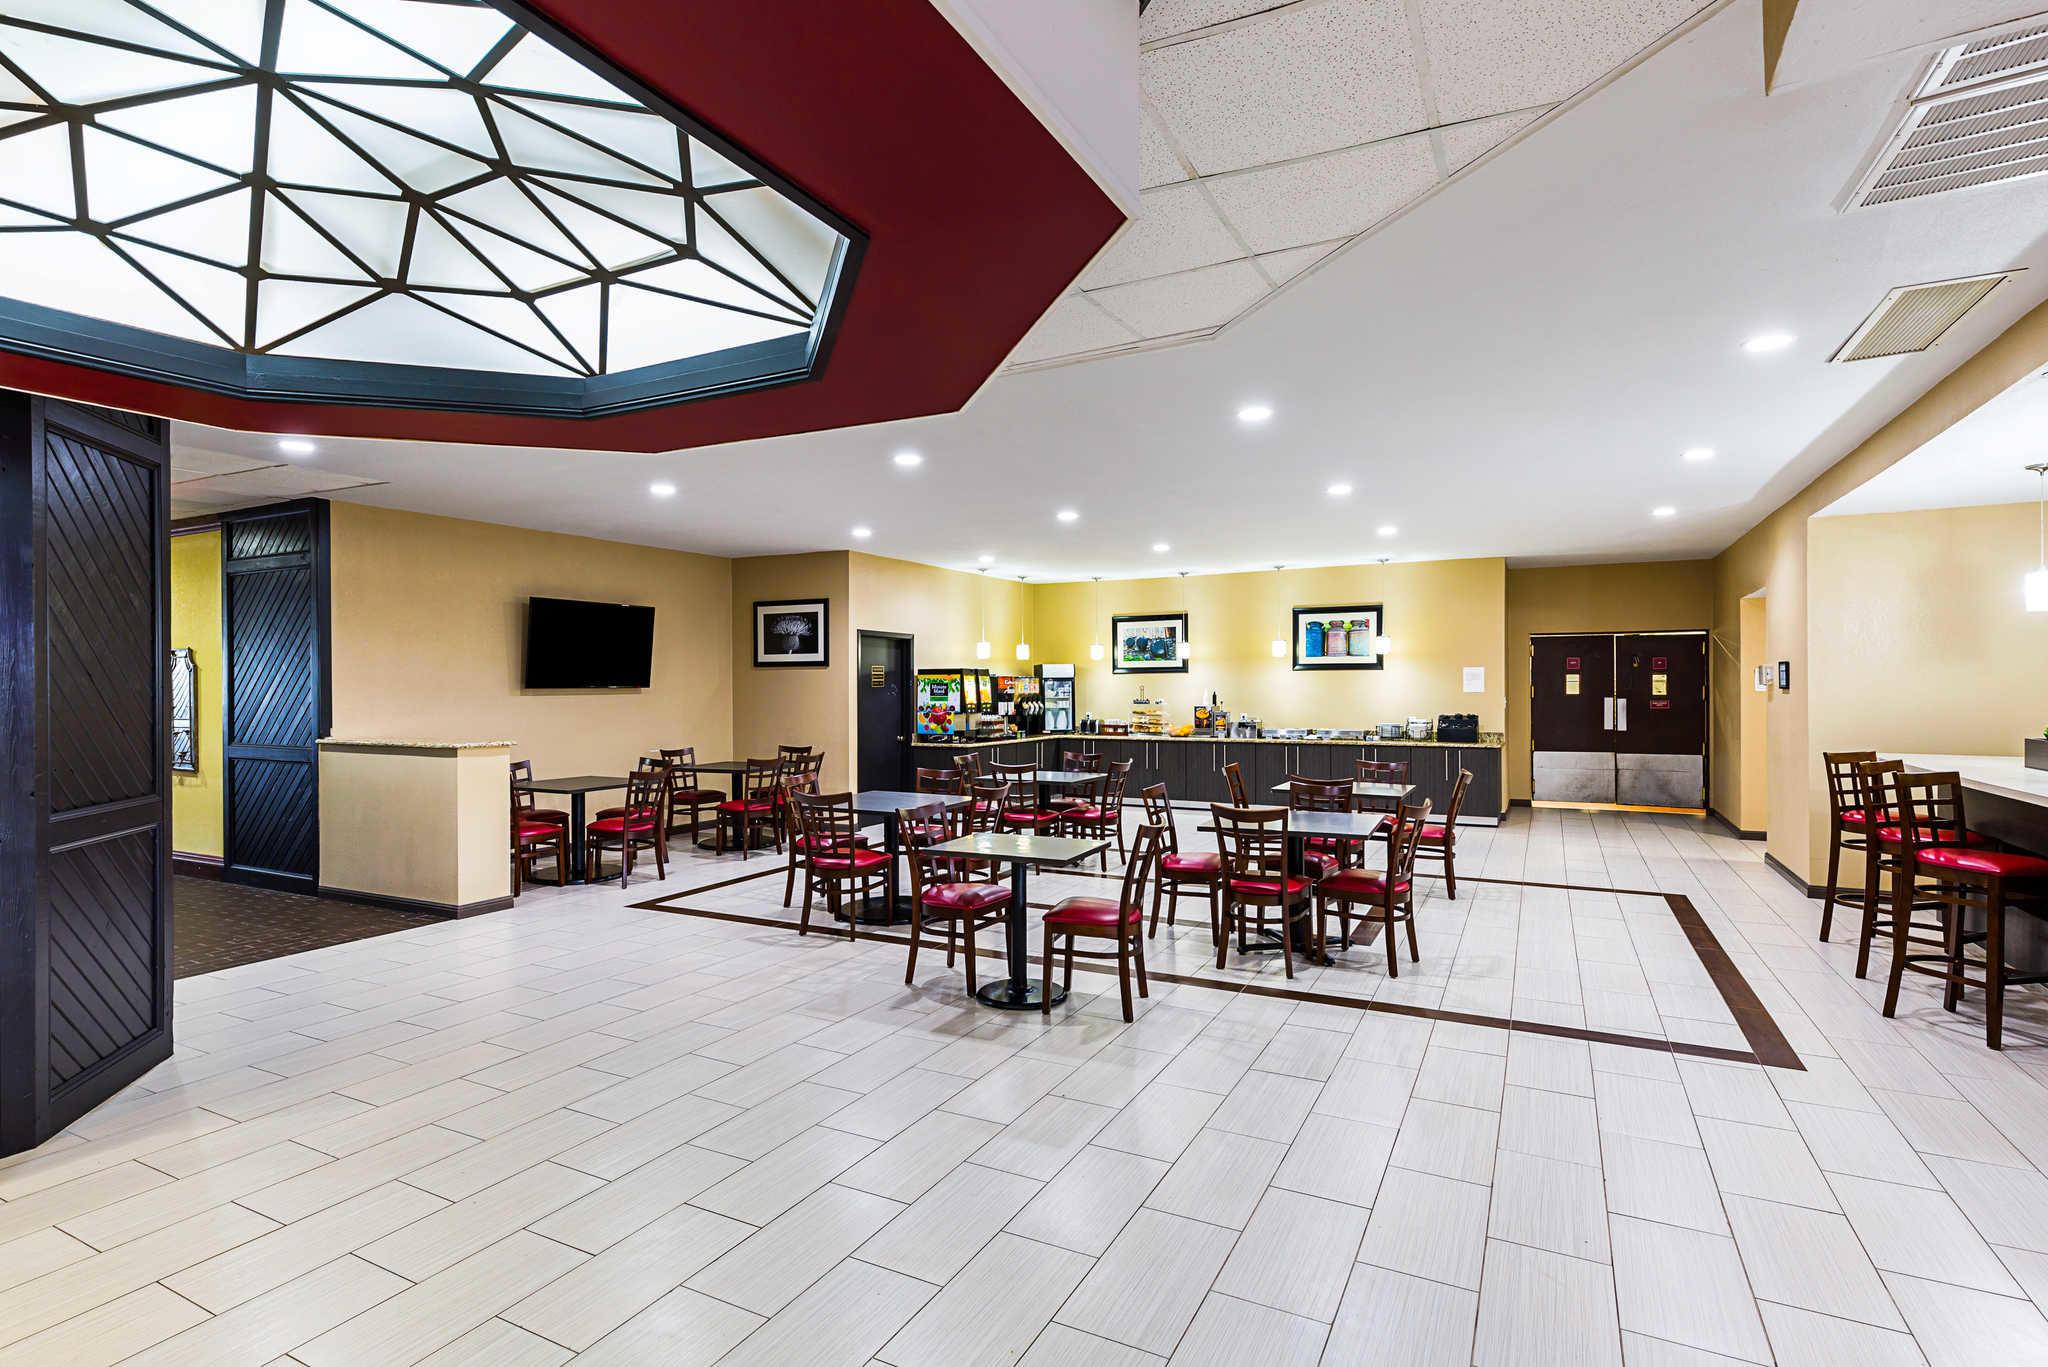 Clarion Inn image 26